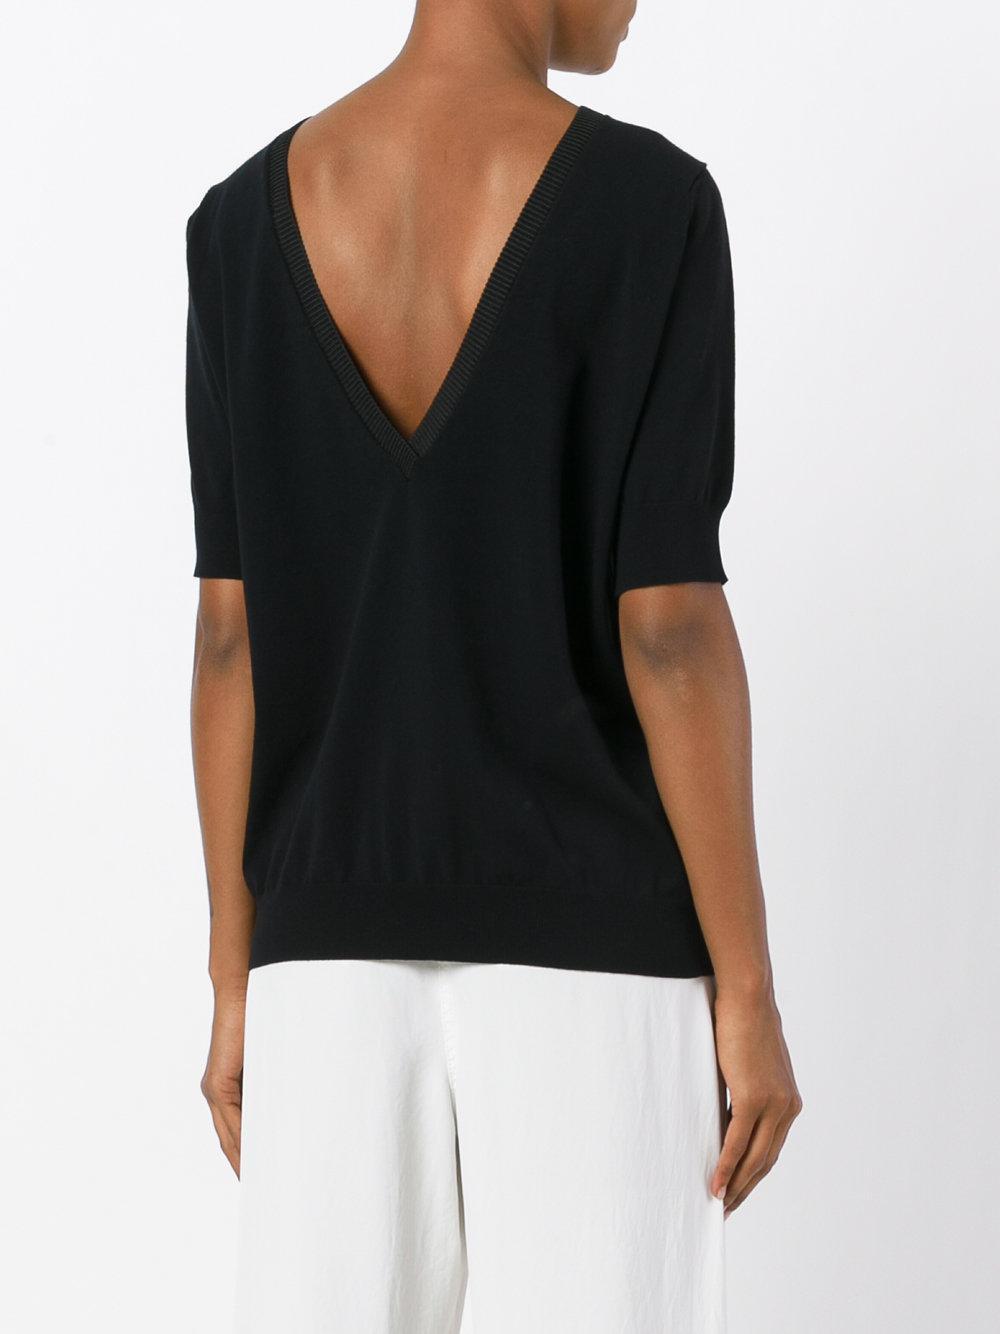 Essentiel Antwerp Synthetic Knitted Top in Black